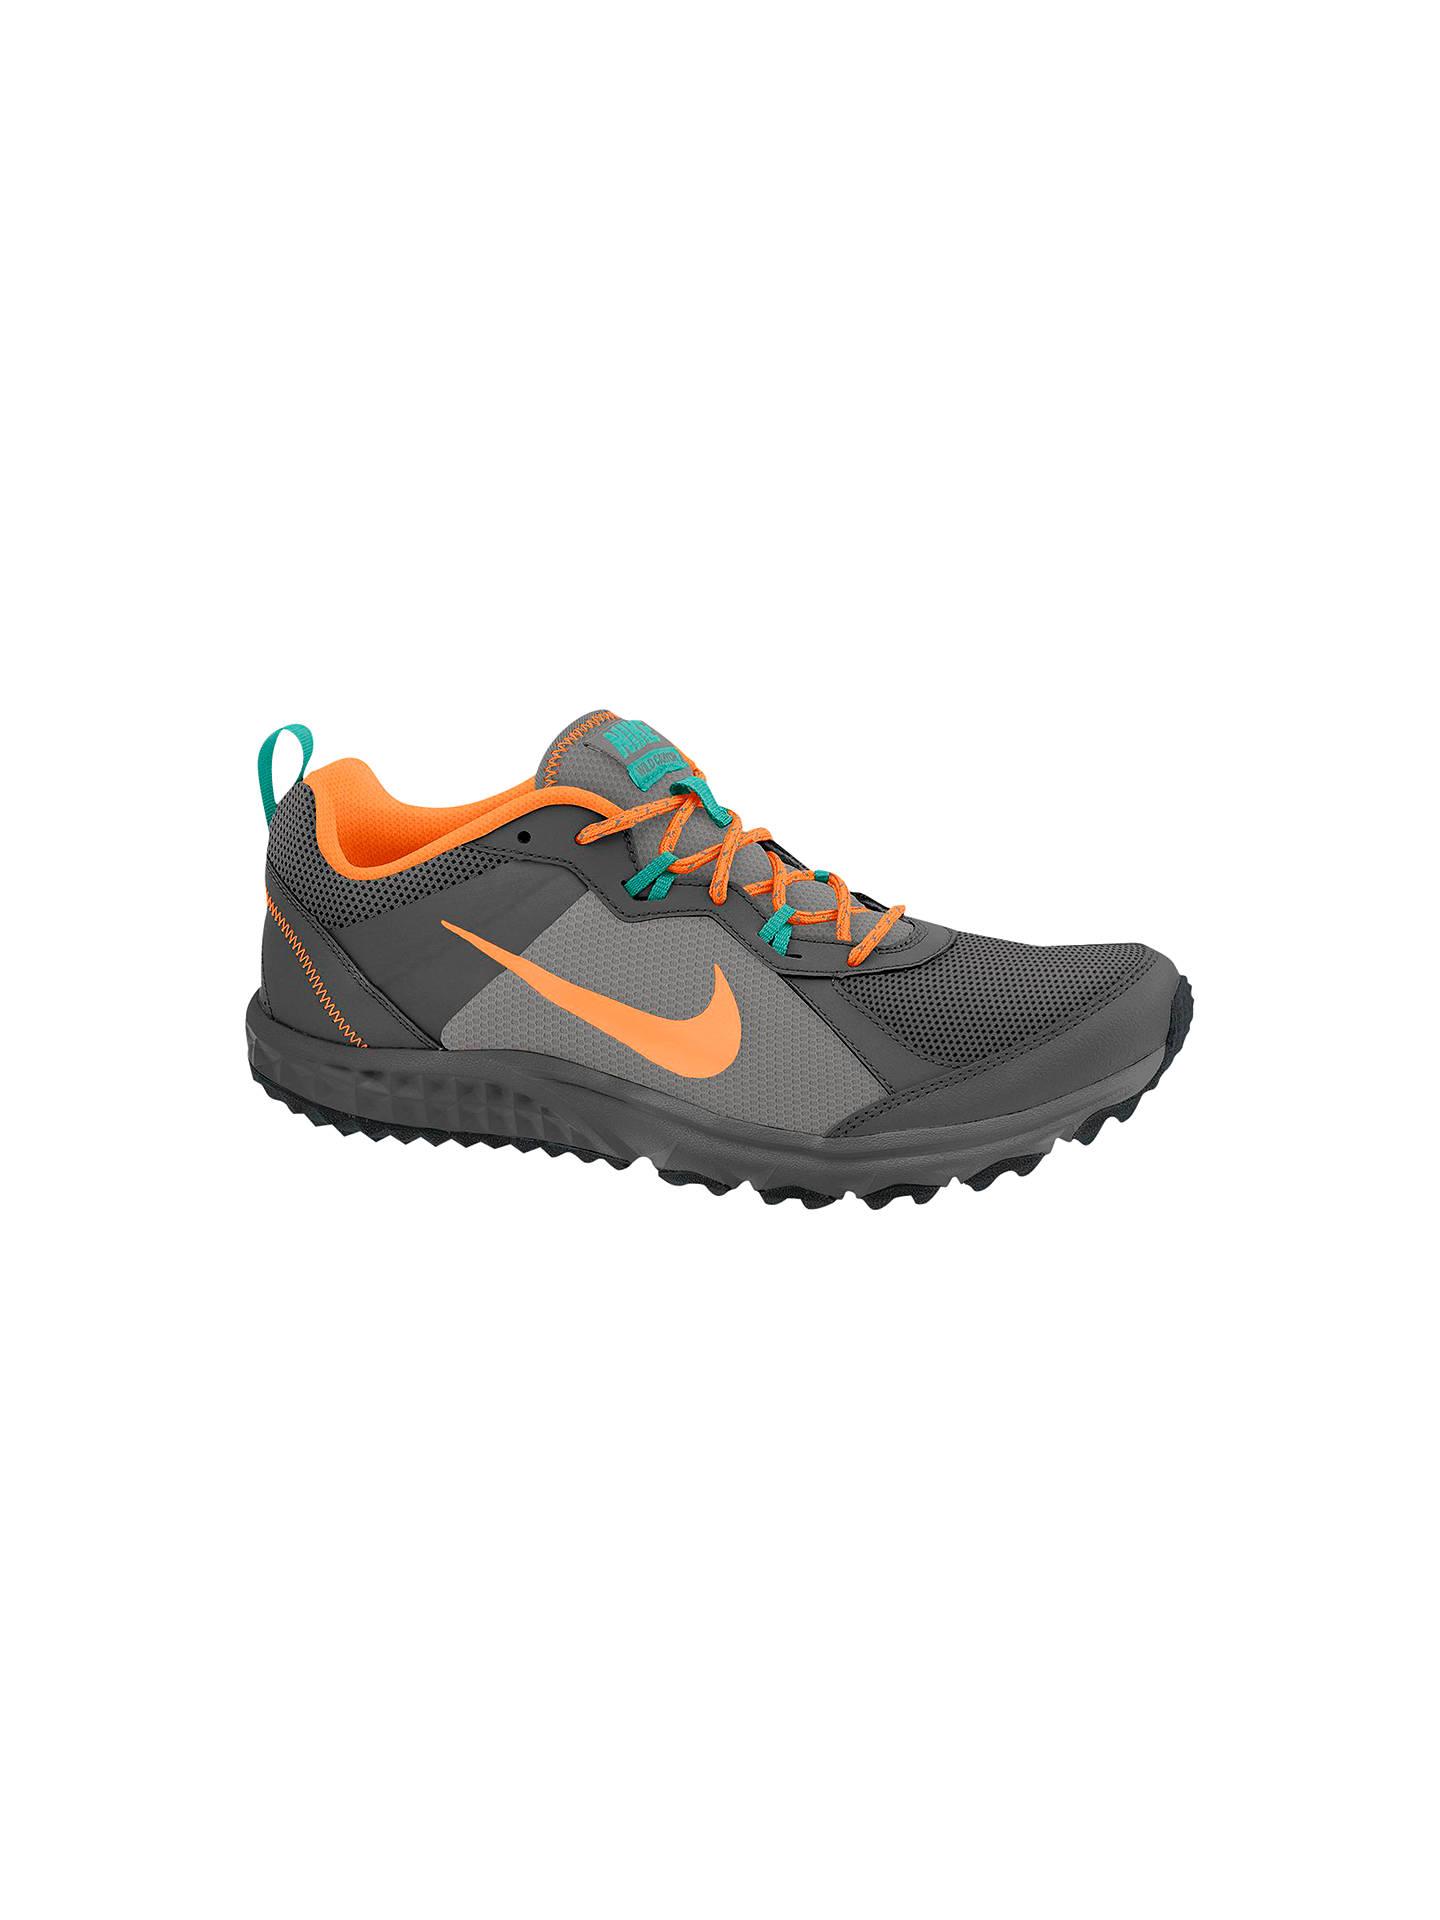 127da8a210a Buy Nike Wild Trail Men s Running Shoes